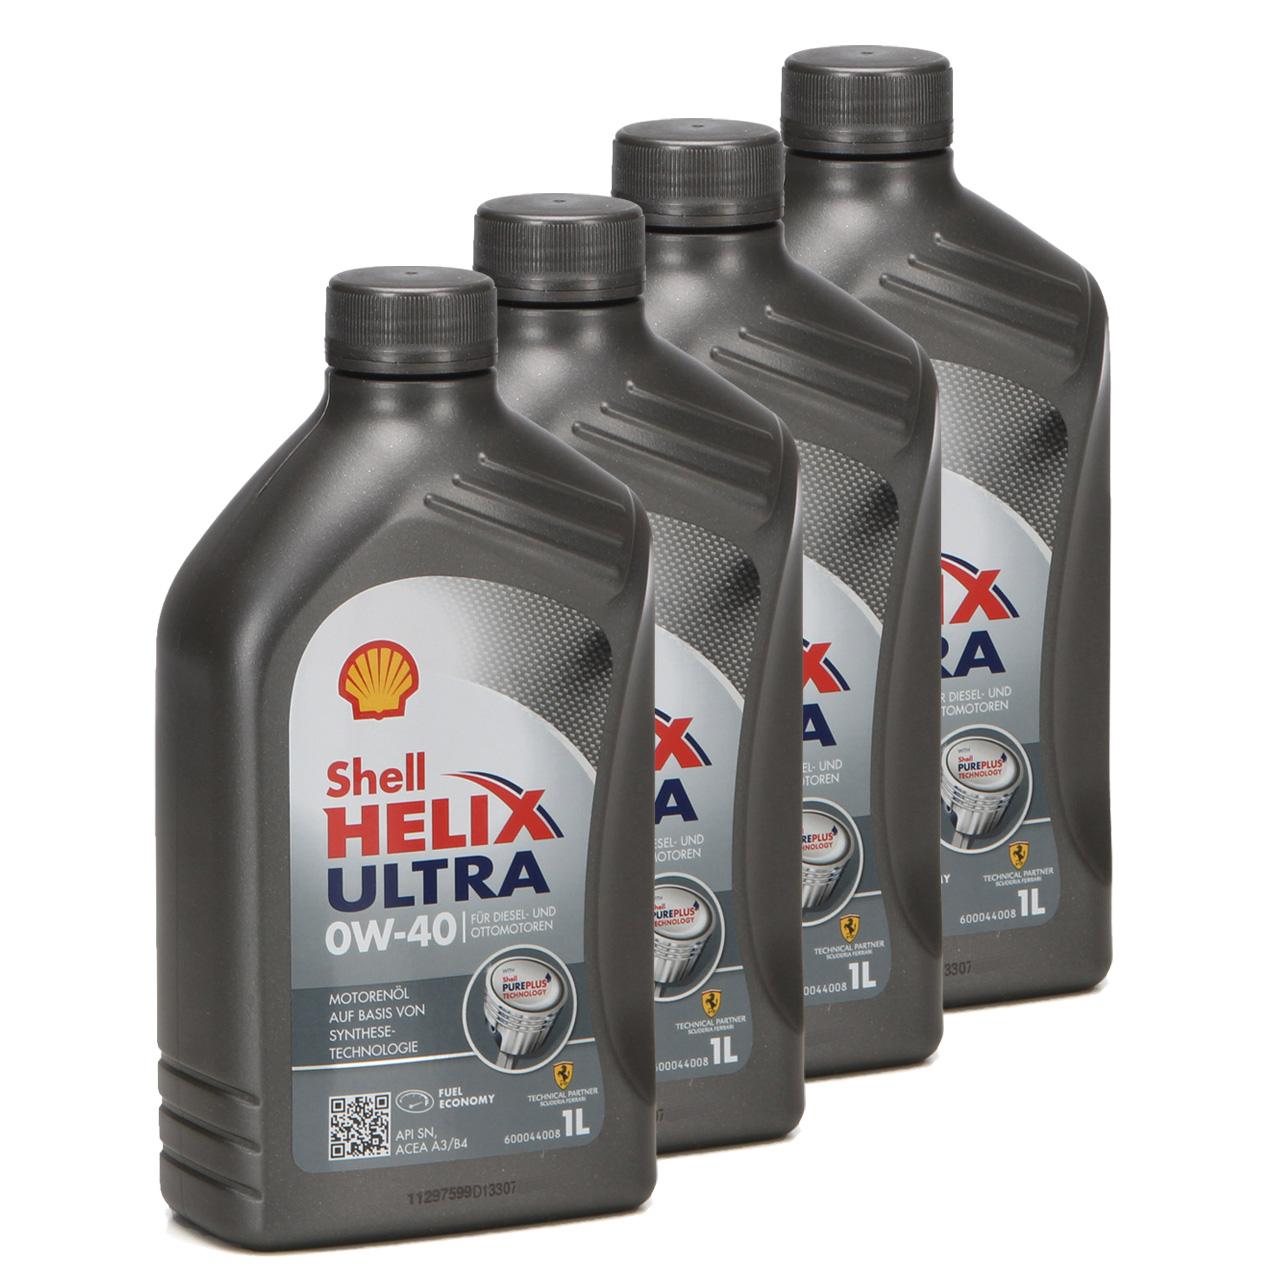 SHELL Motoröl Öl HELIX ULTRA 0W40 MB 229.5/226.5 VW 502.00/505.00 - 4L 4 Liter